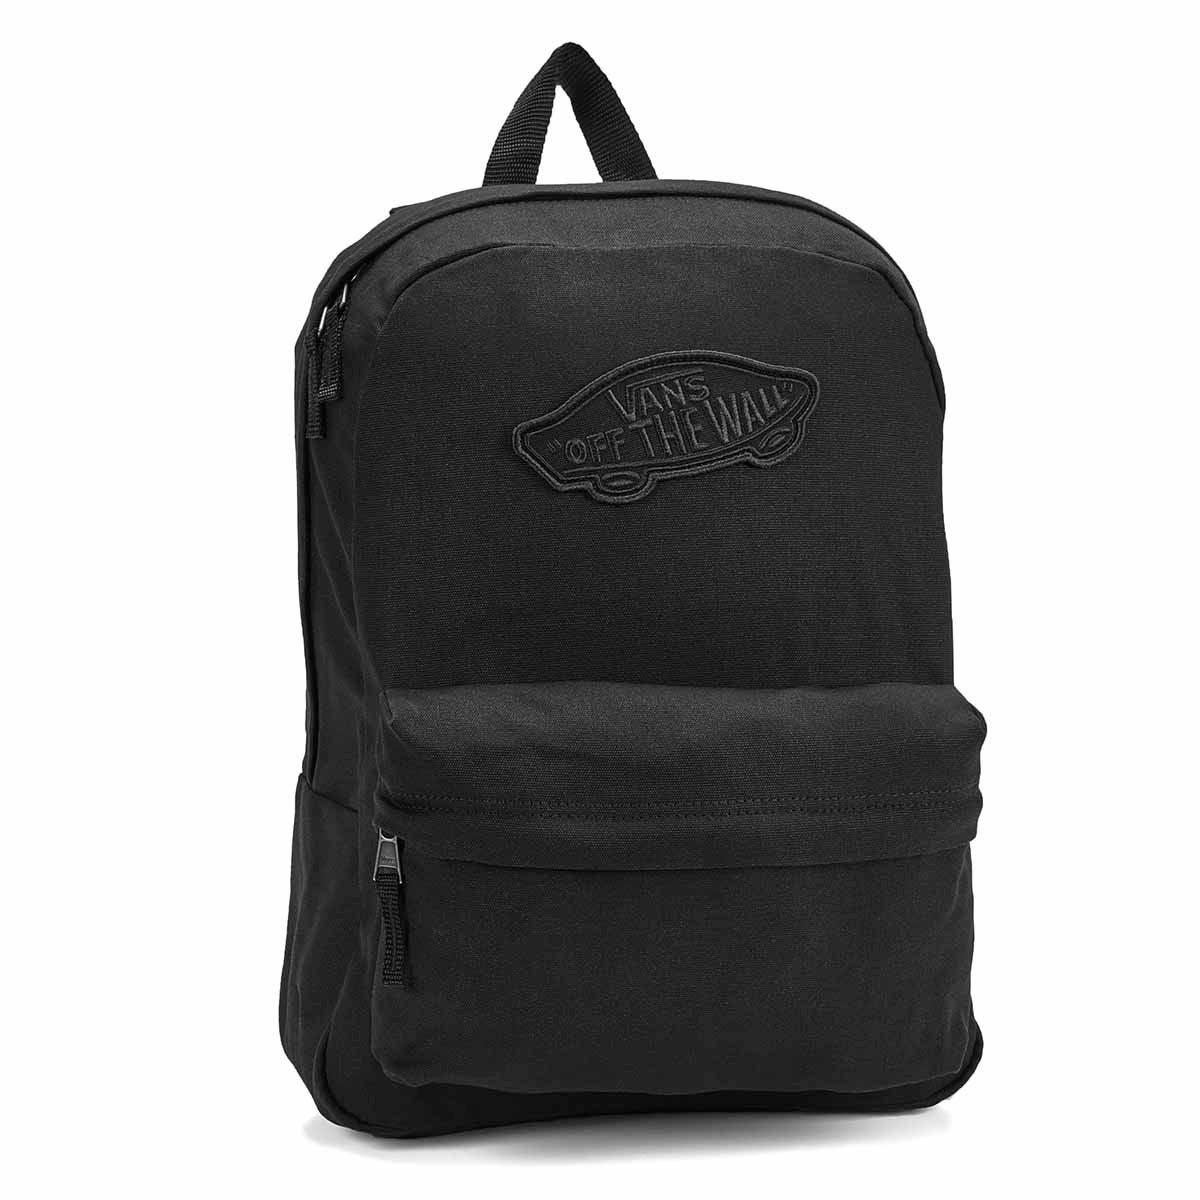 Vans Realm onyx backpack